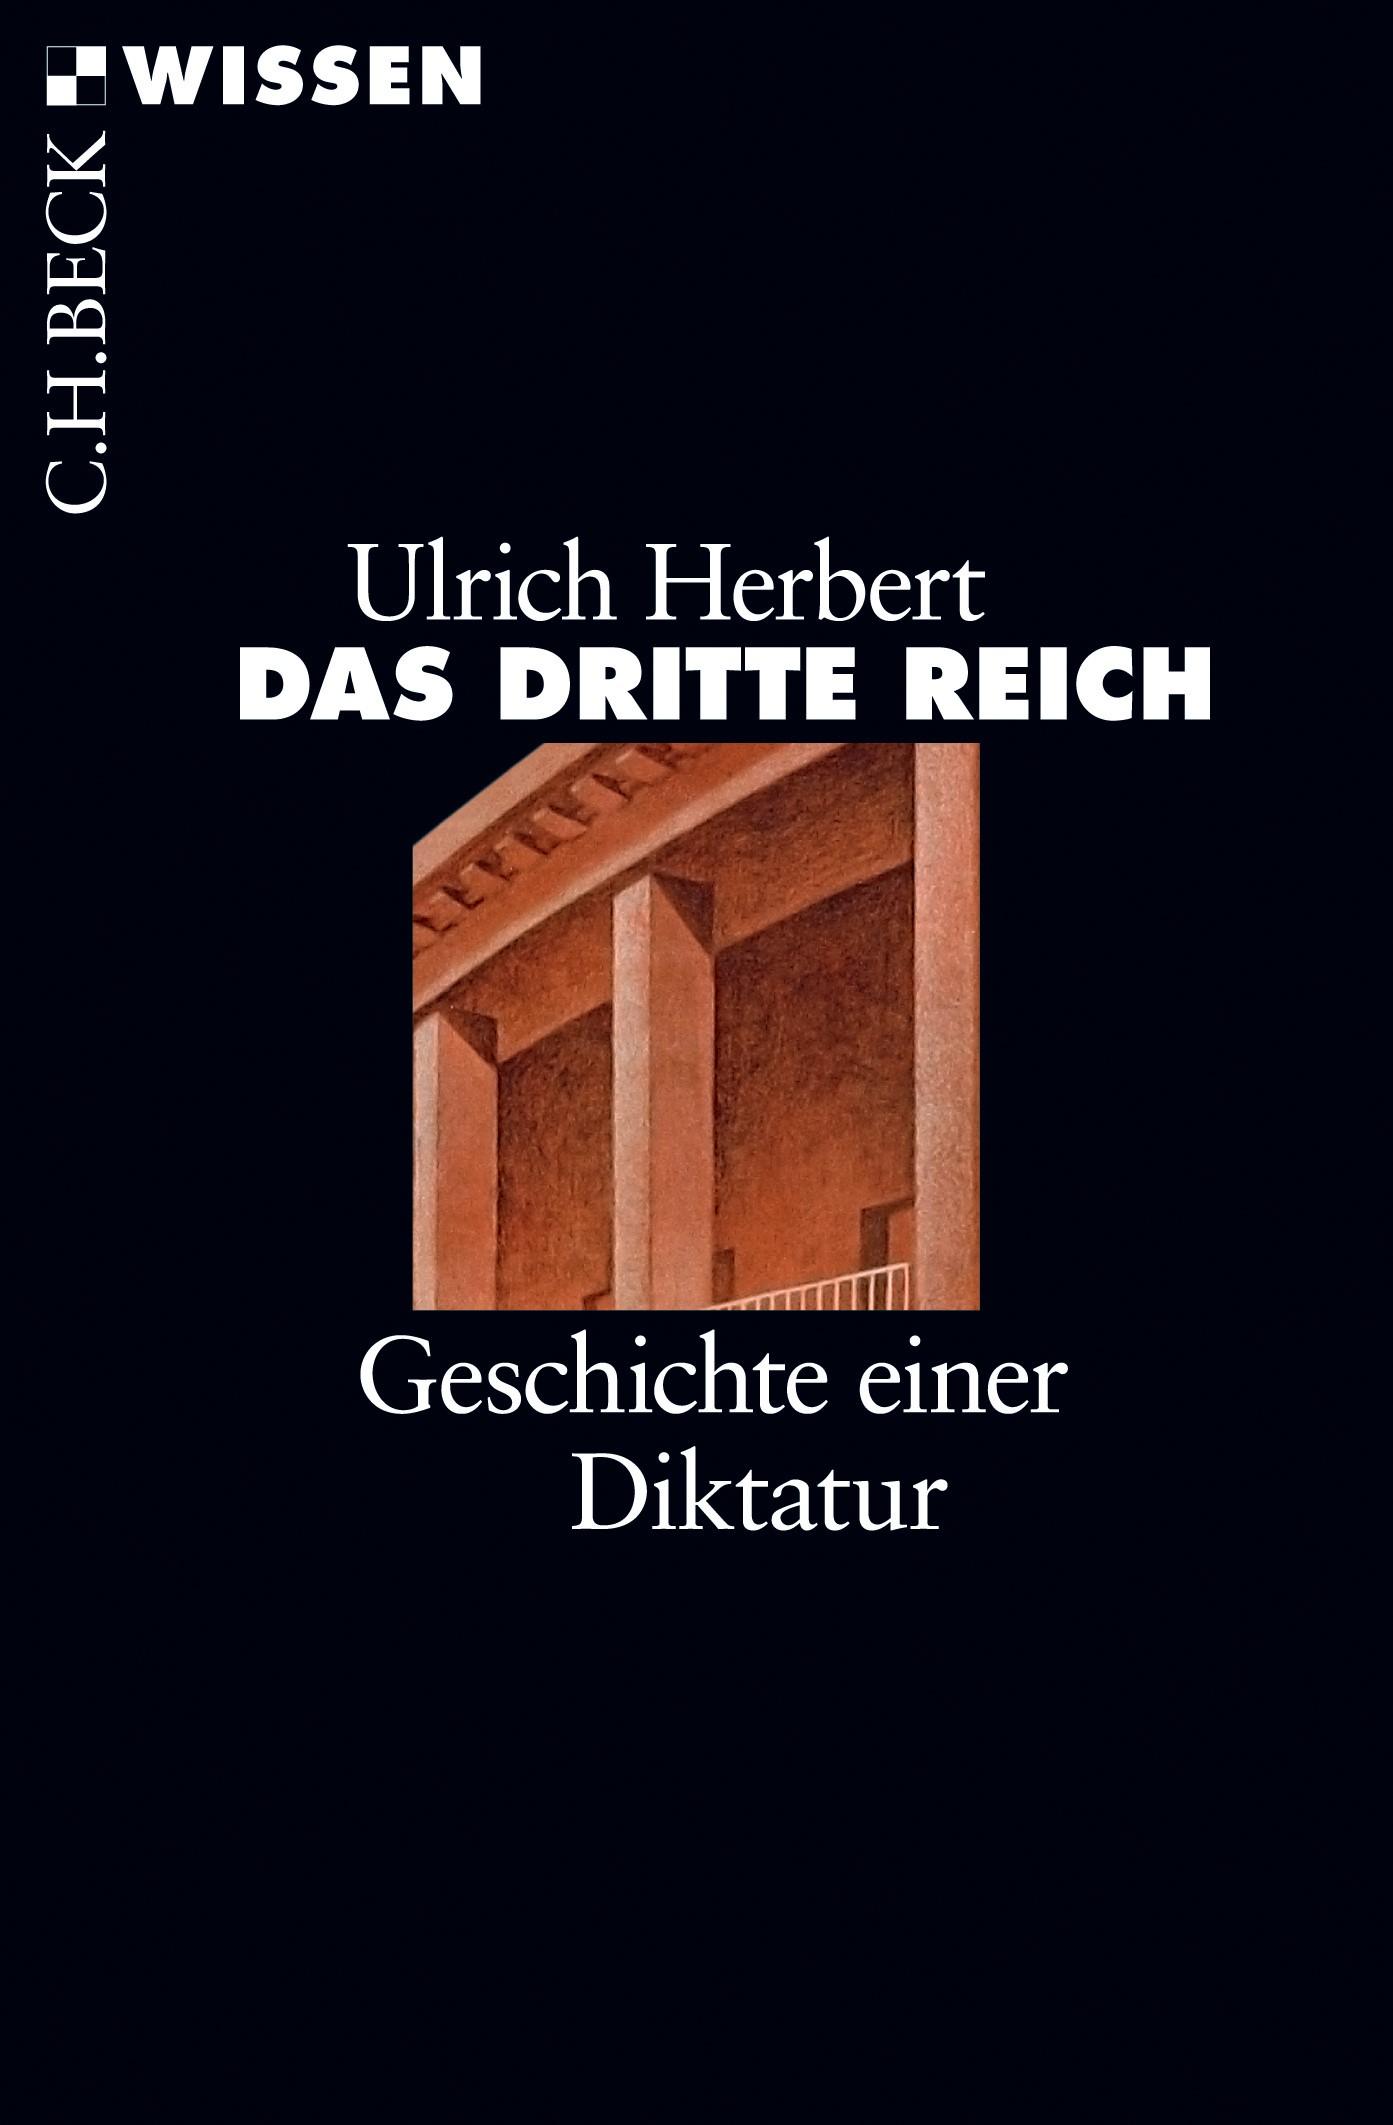 Das Dritte Reich | 3. Auflage | Buch (Cover)